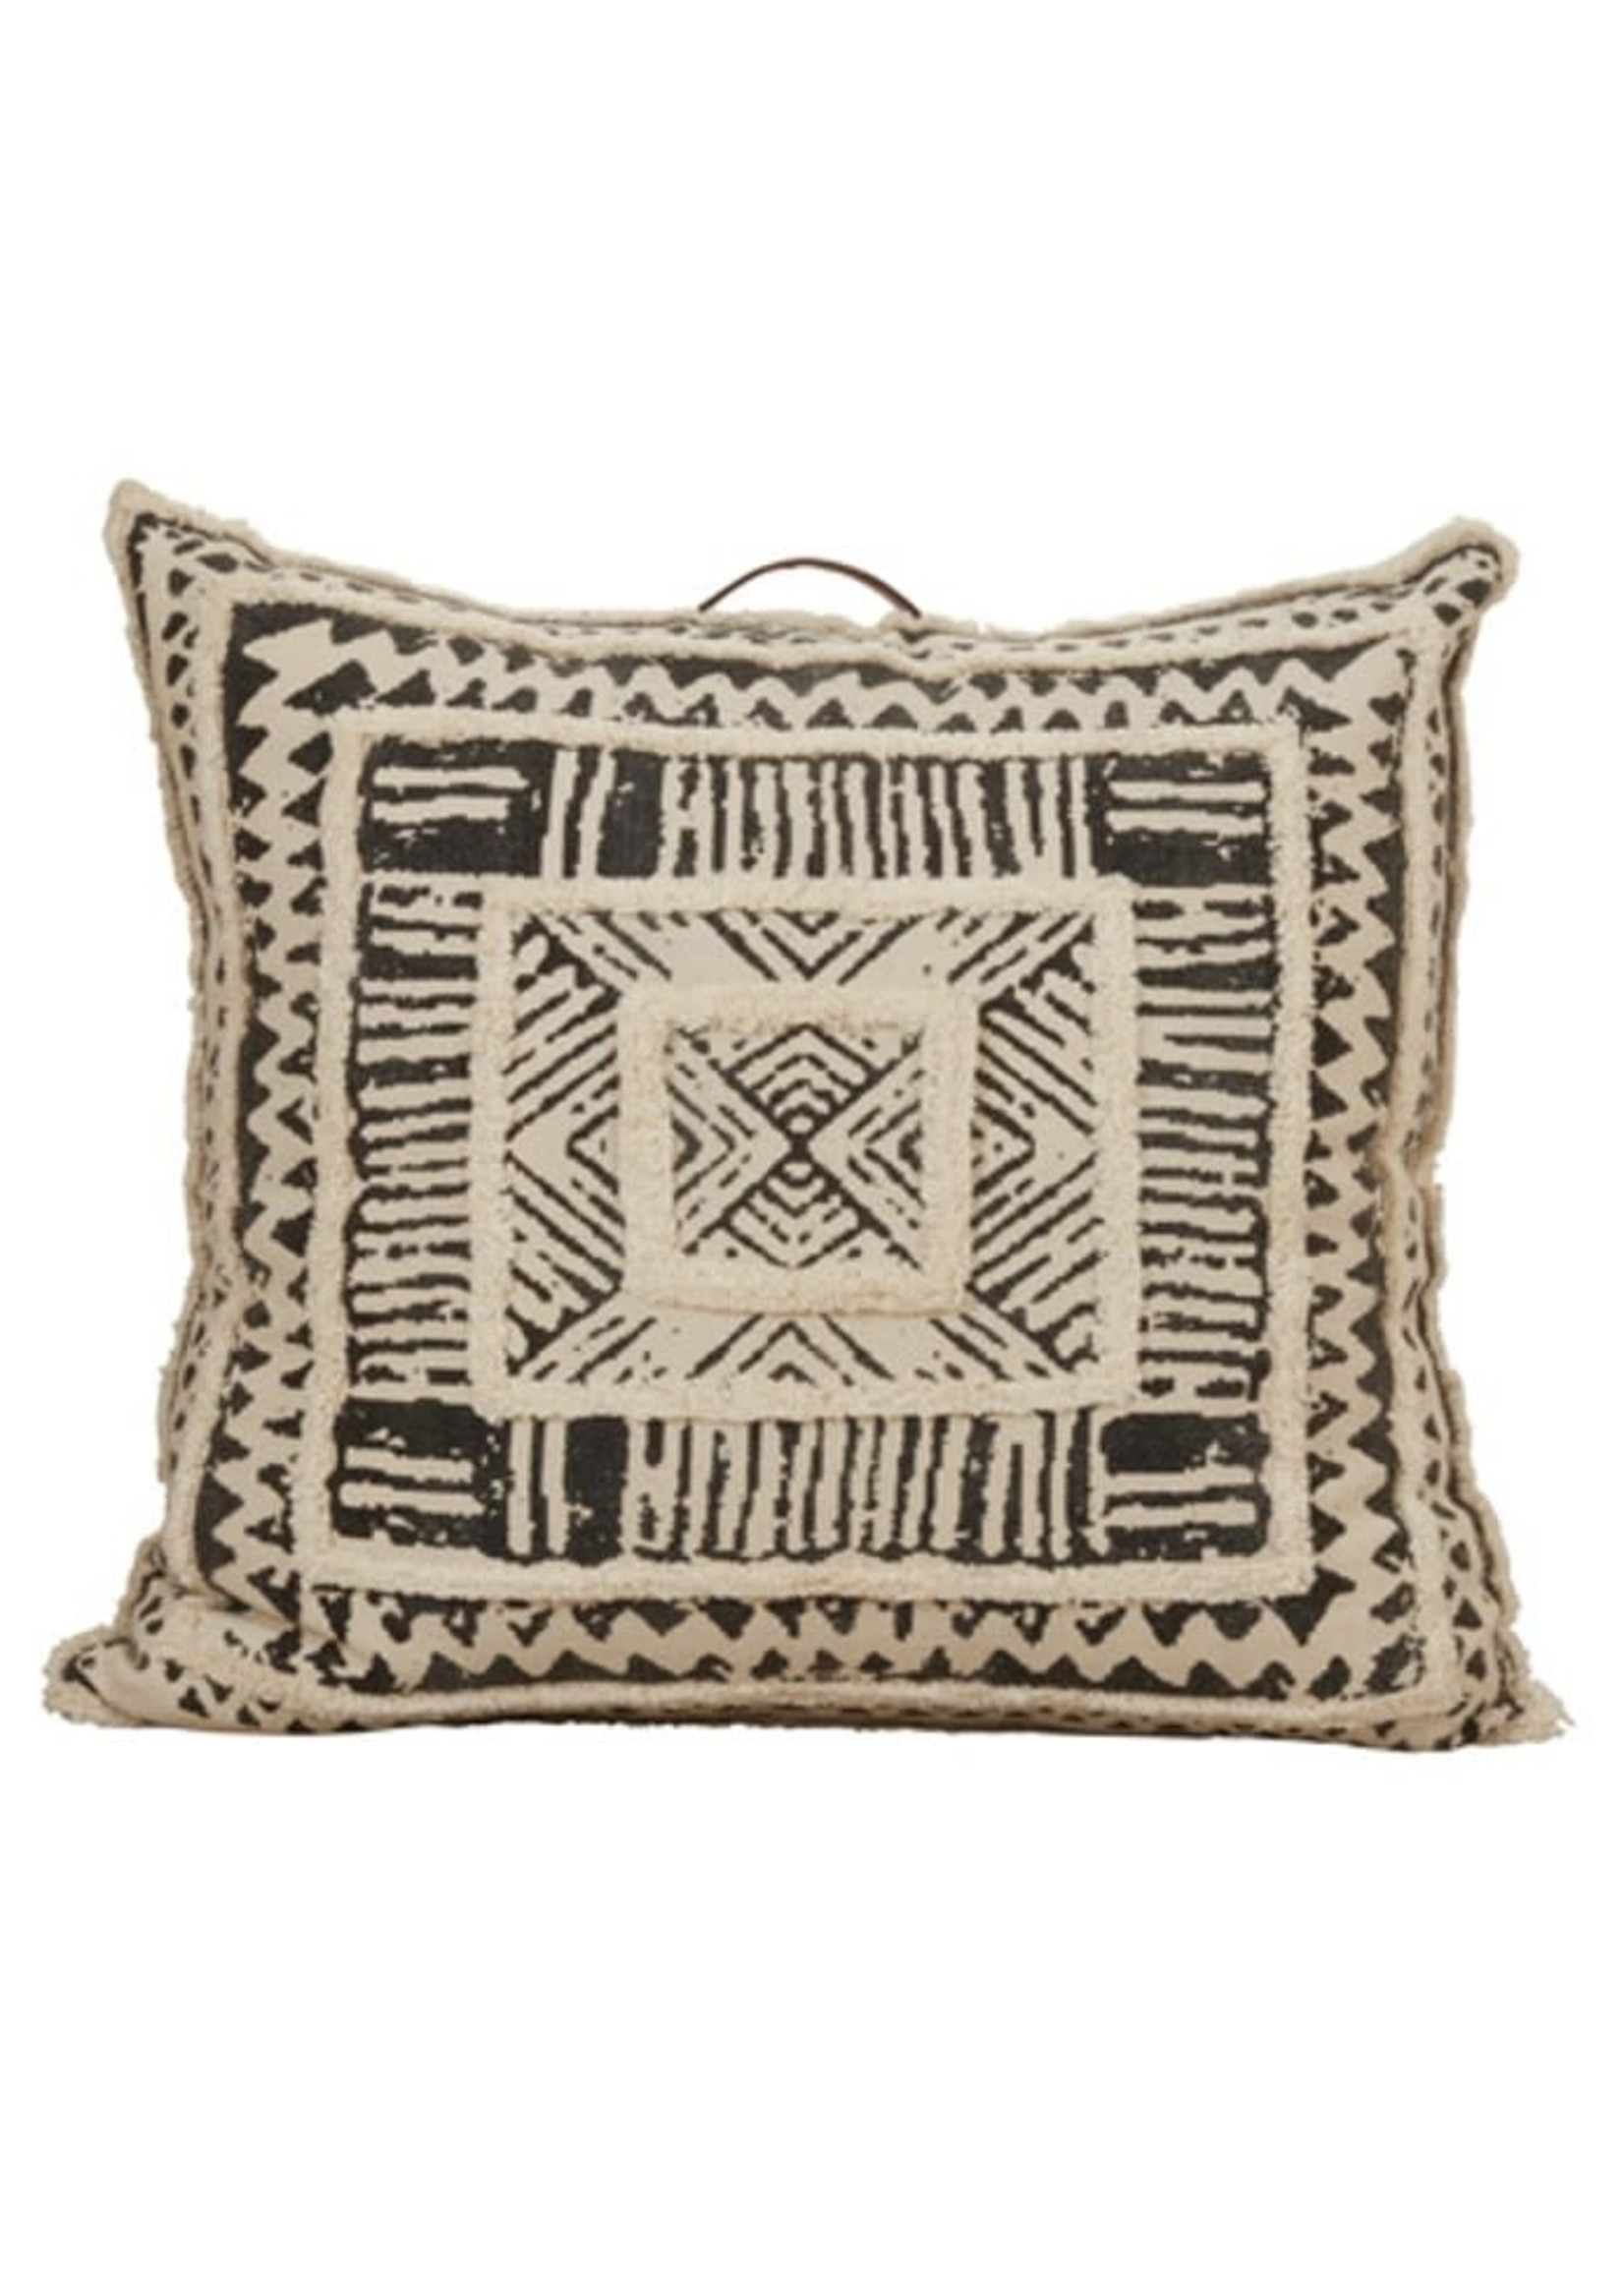 Saro SARO Printed Tufted Floor Pillow Poly Filled - Black